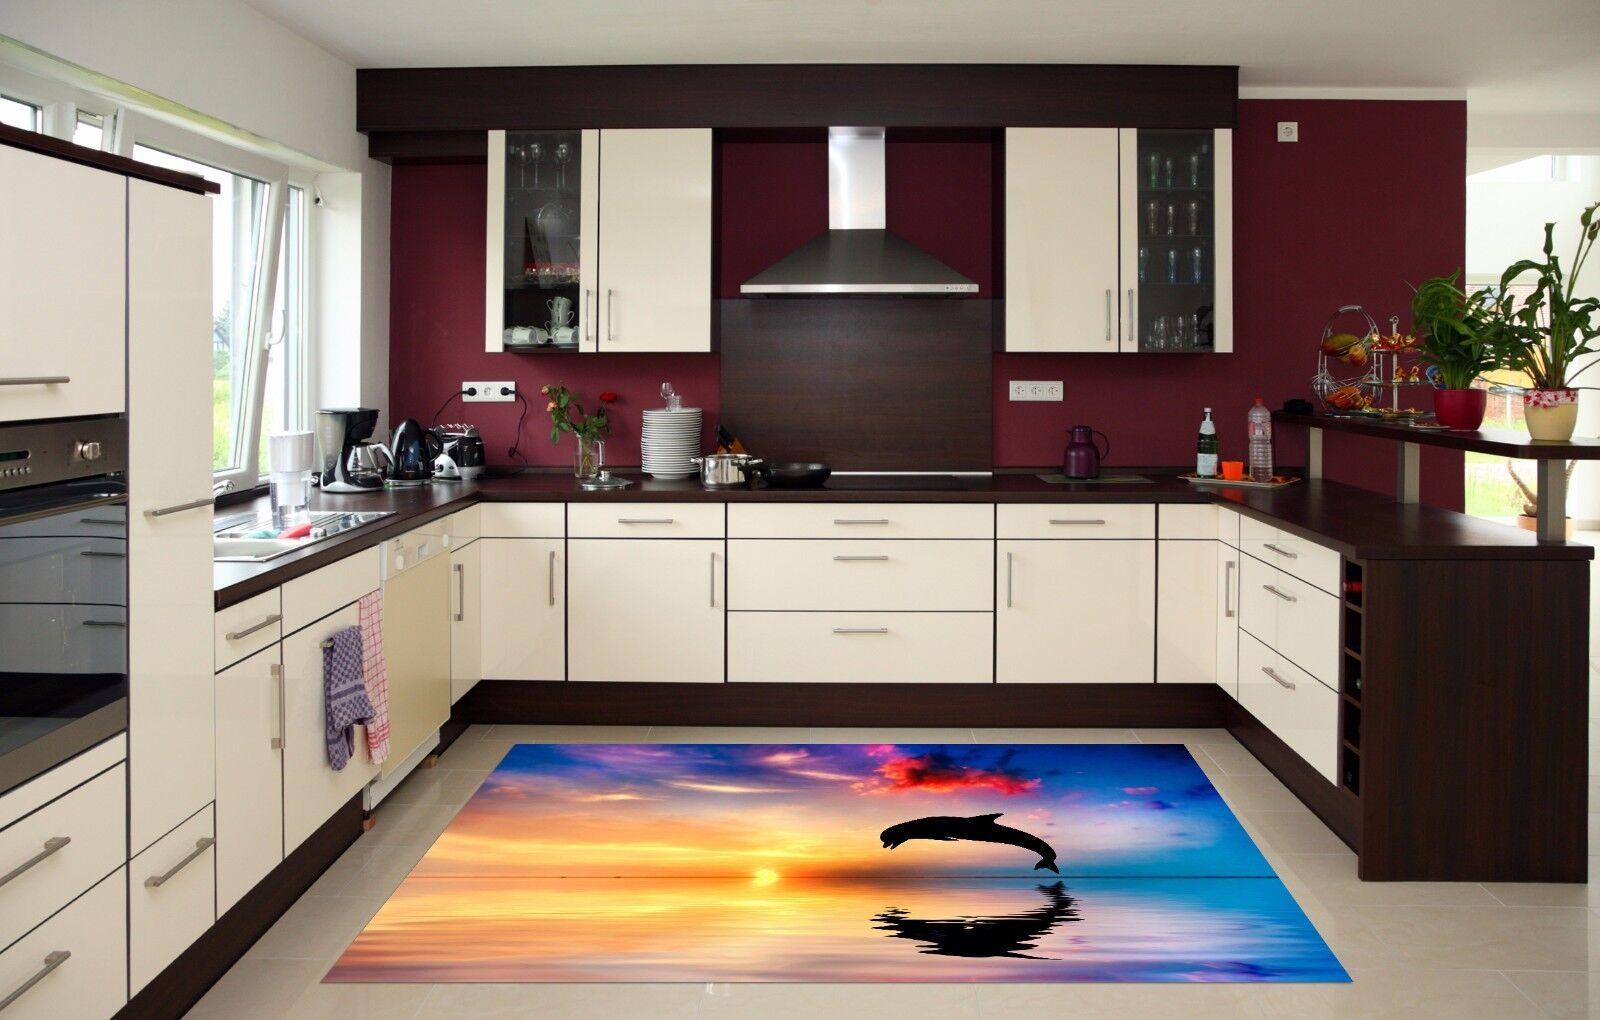 3D Dusk Dolphin13 Kitchen Mat Floor Murals Wall Print Wall Deco AJ WALLPAPER UK